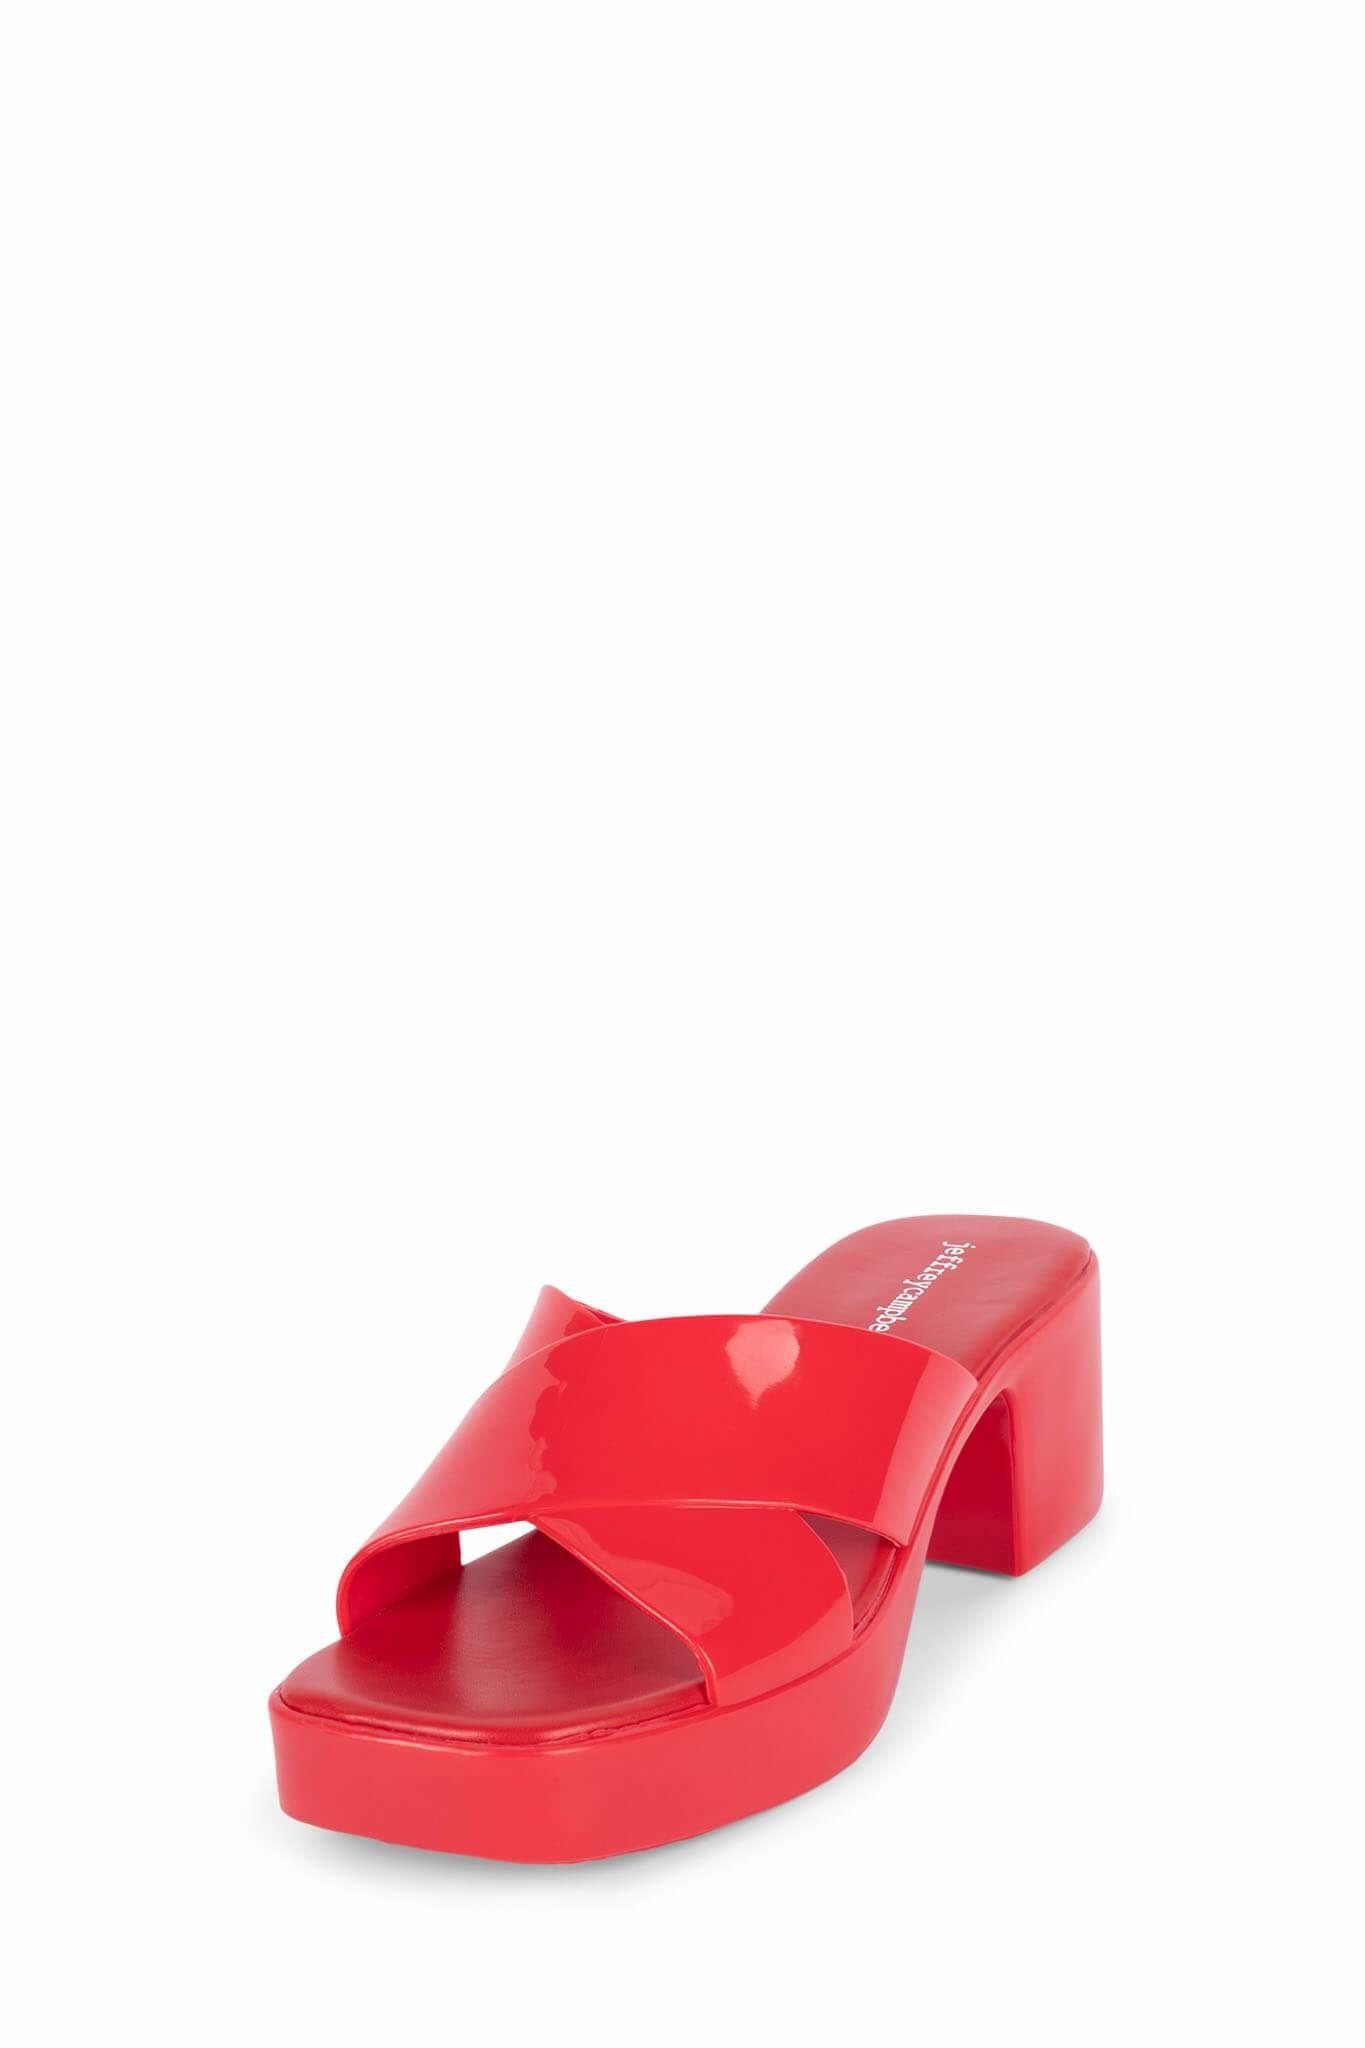 Jeffrey Campbell Bubblegum Red Jelly Sandal